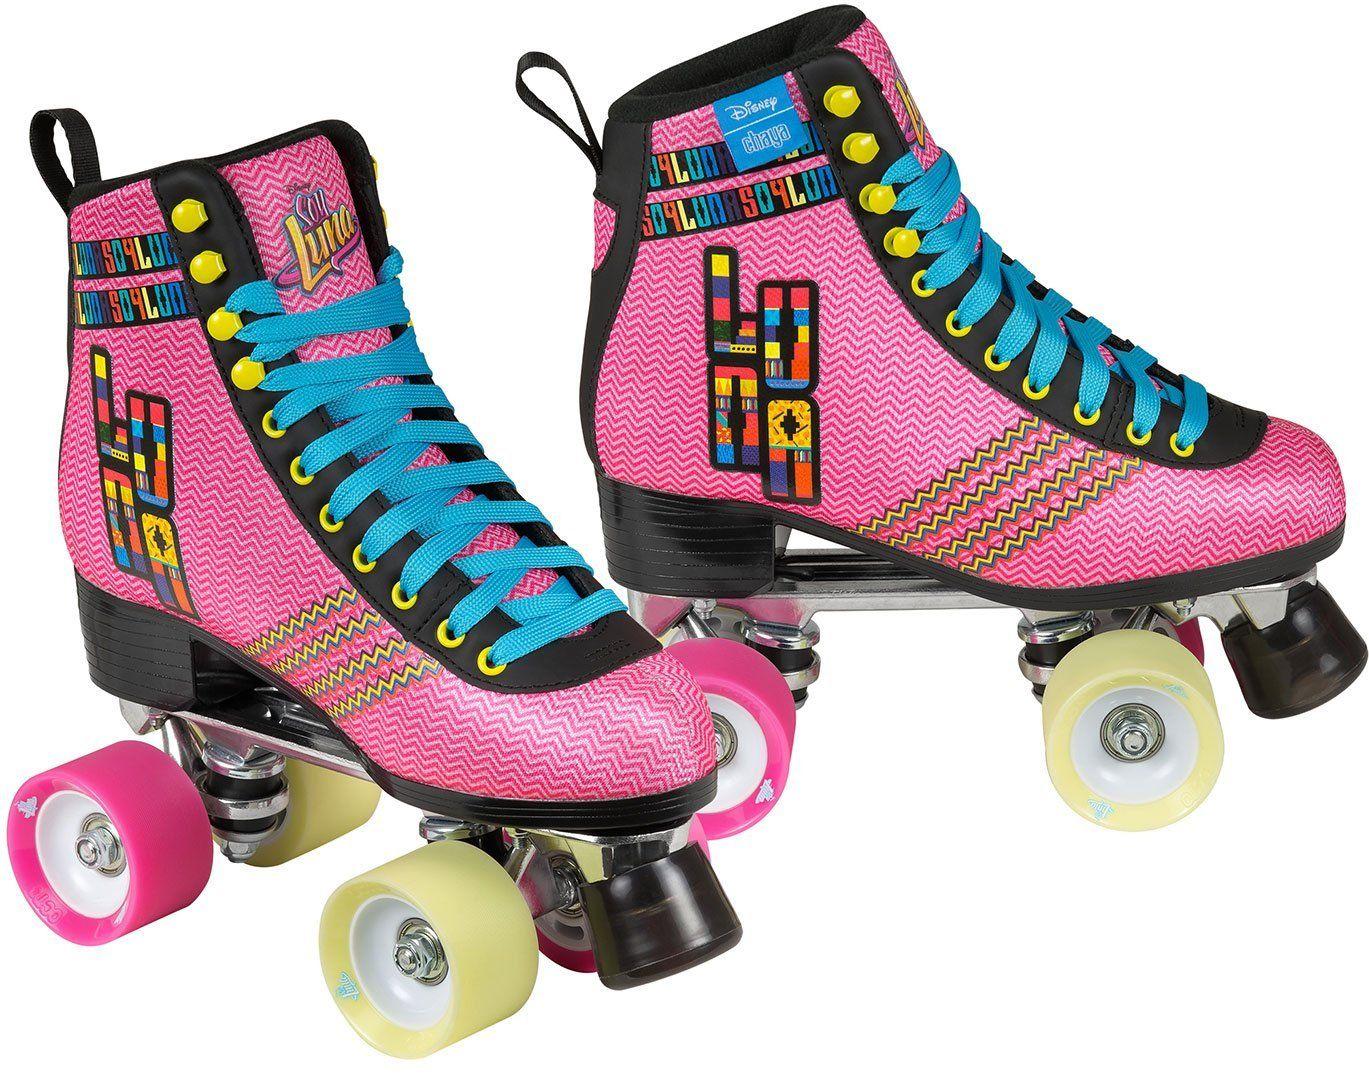 63b40defe16 Disney Soy Luna -''Mexicana'' Rollerskates from Chaya Brand! #chaya  #rollerskates #quads #itstime #soyluna #disney #vintage #retro #style # fashion #disney